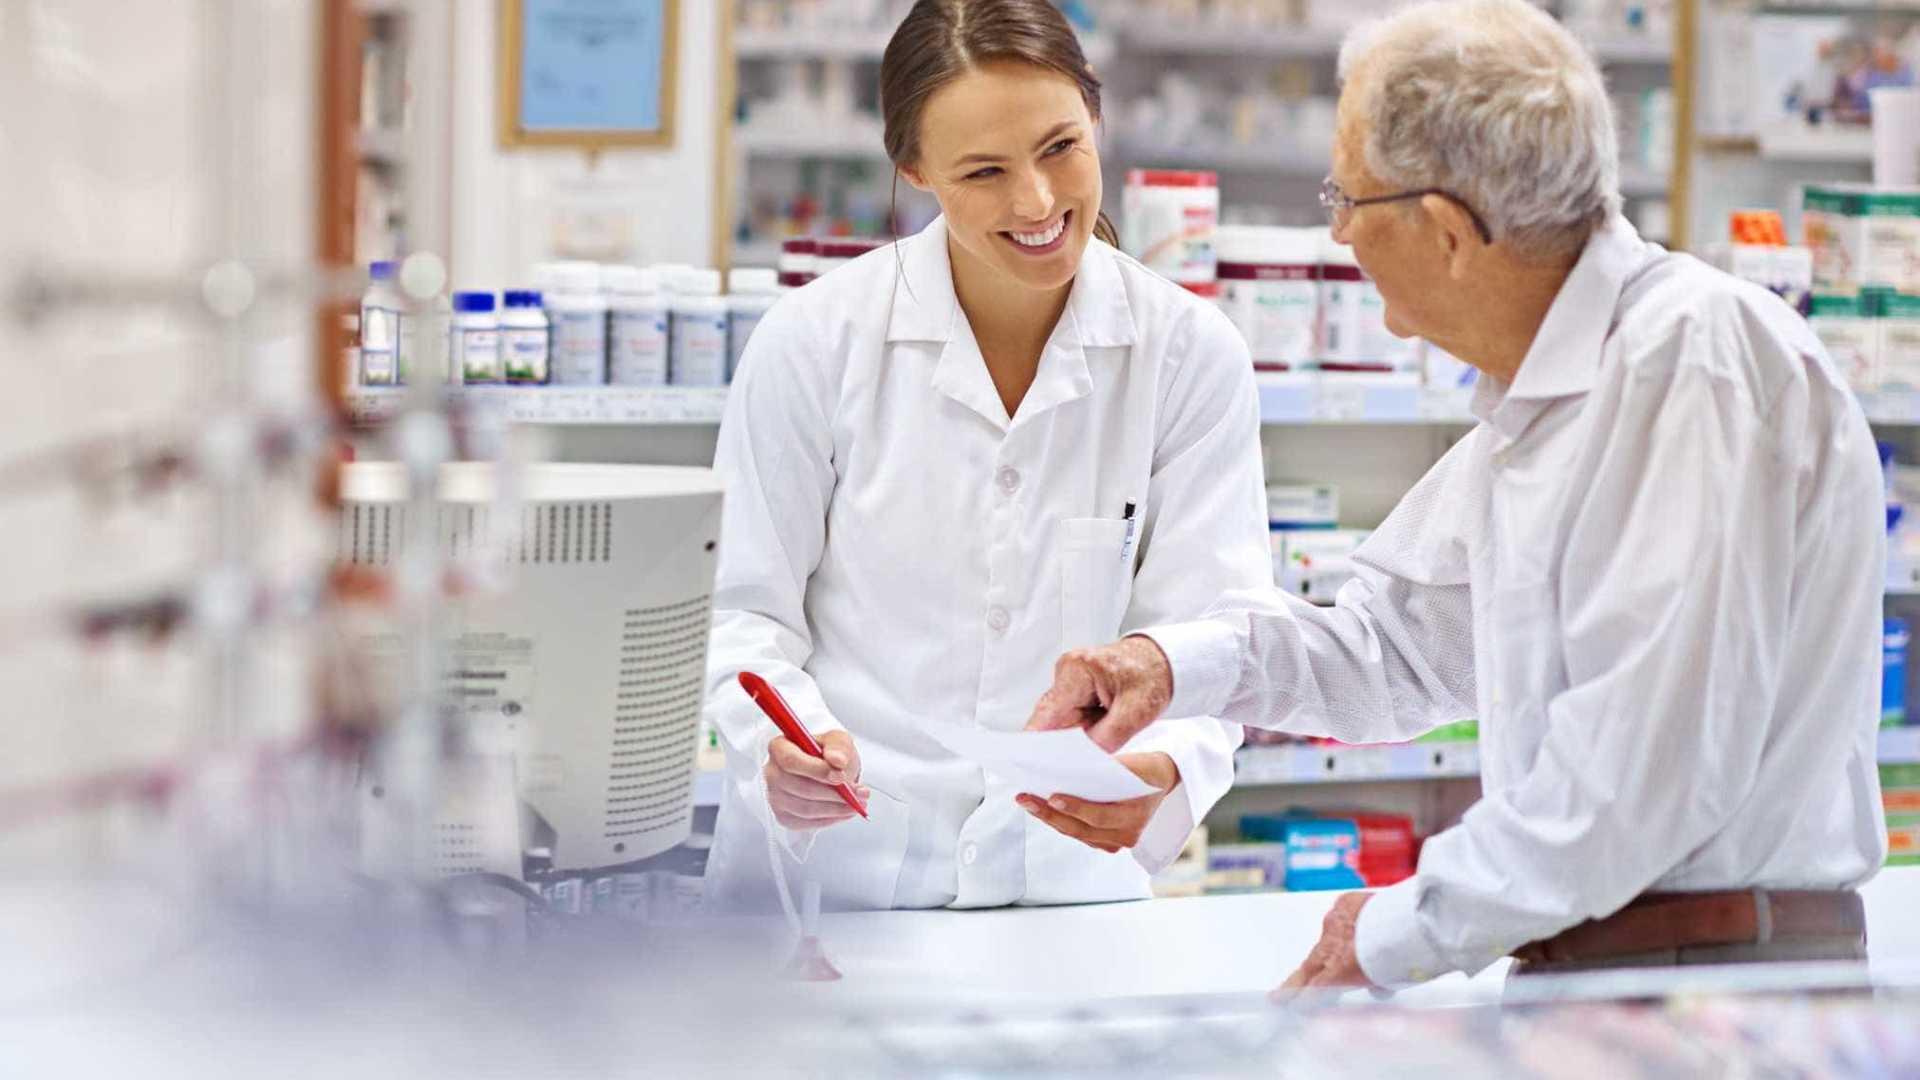 Receta médica farmacia